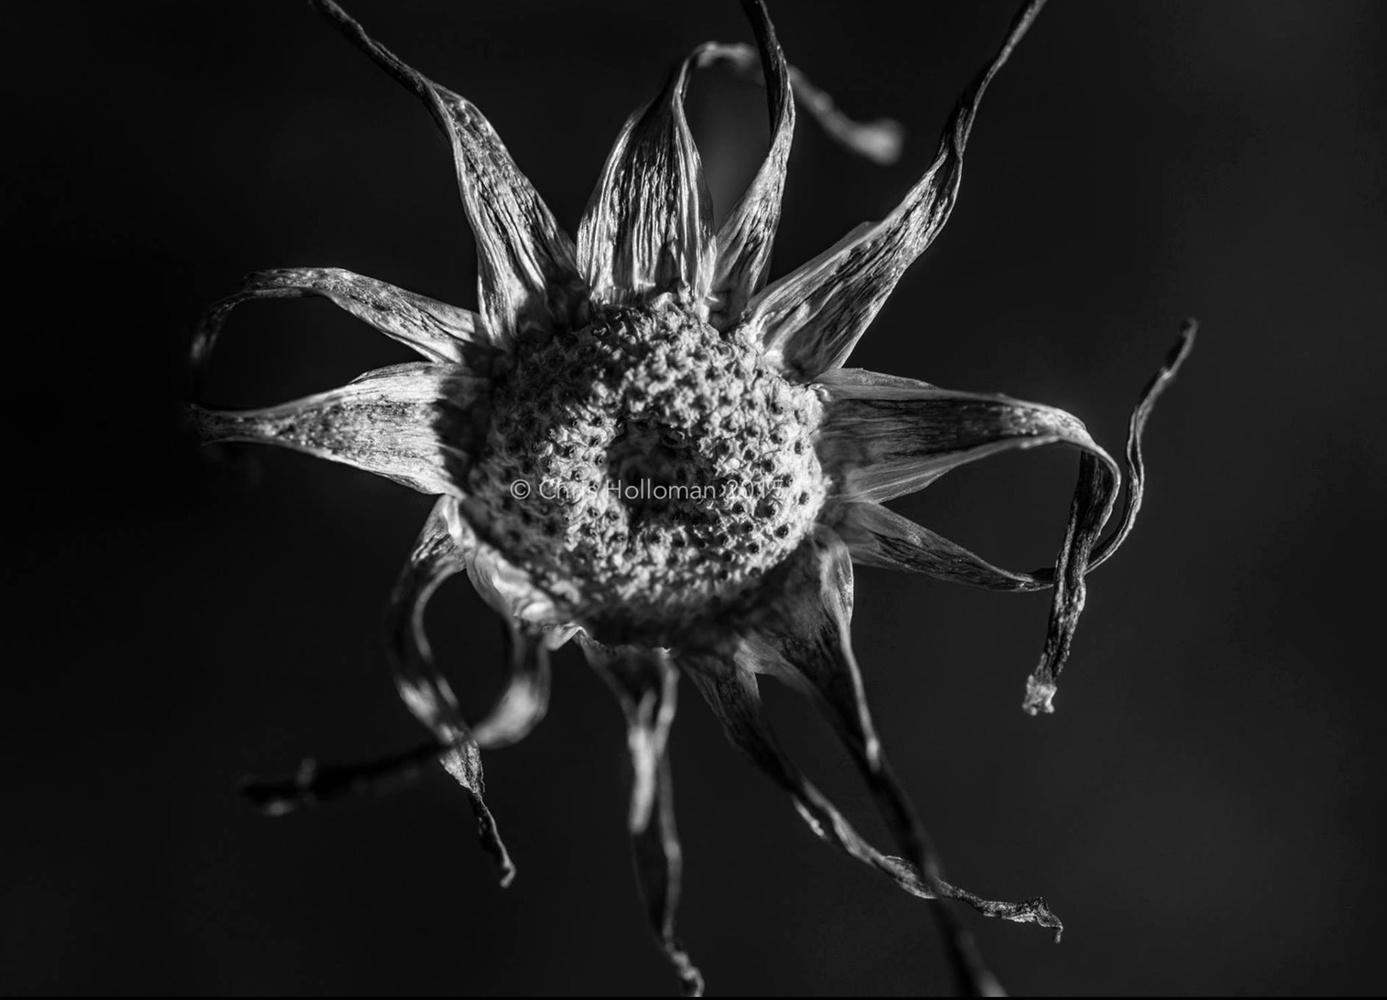 Dandelion's Last Day by Chris Holloman